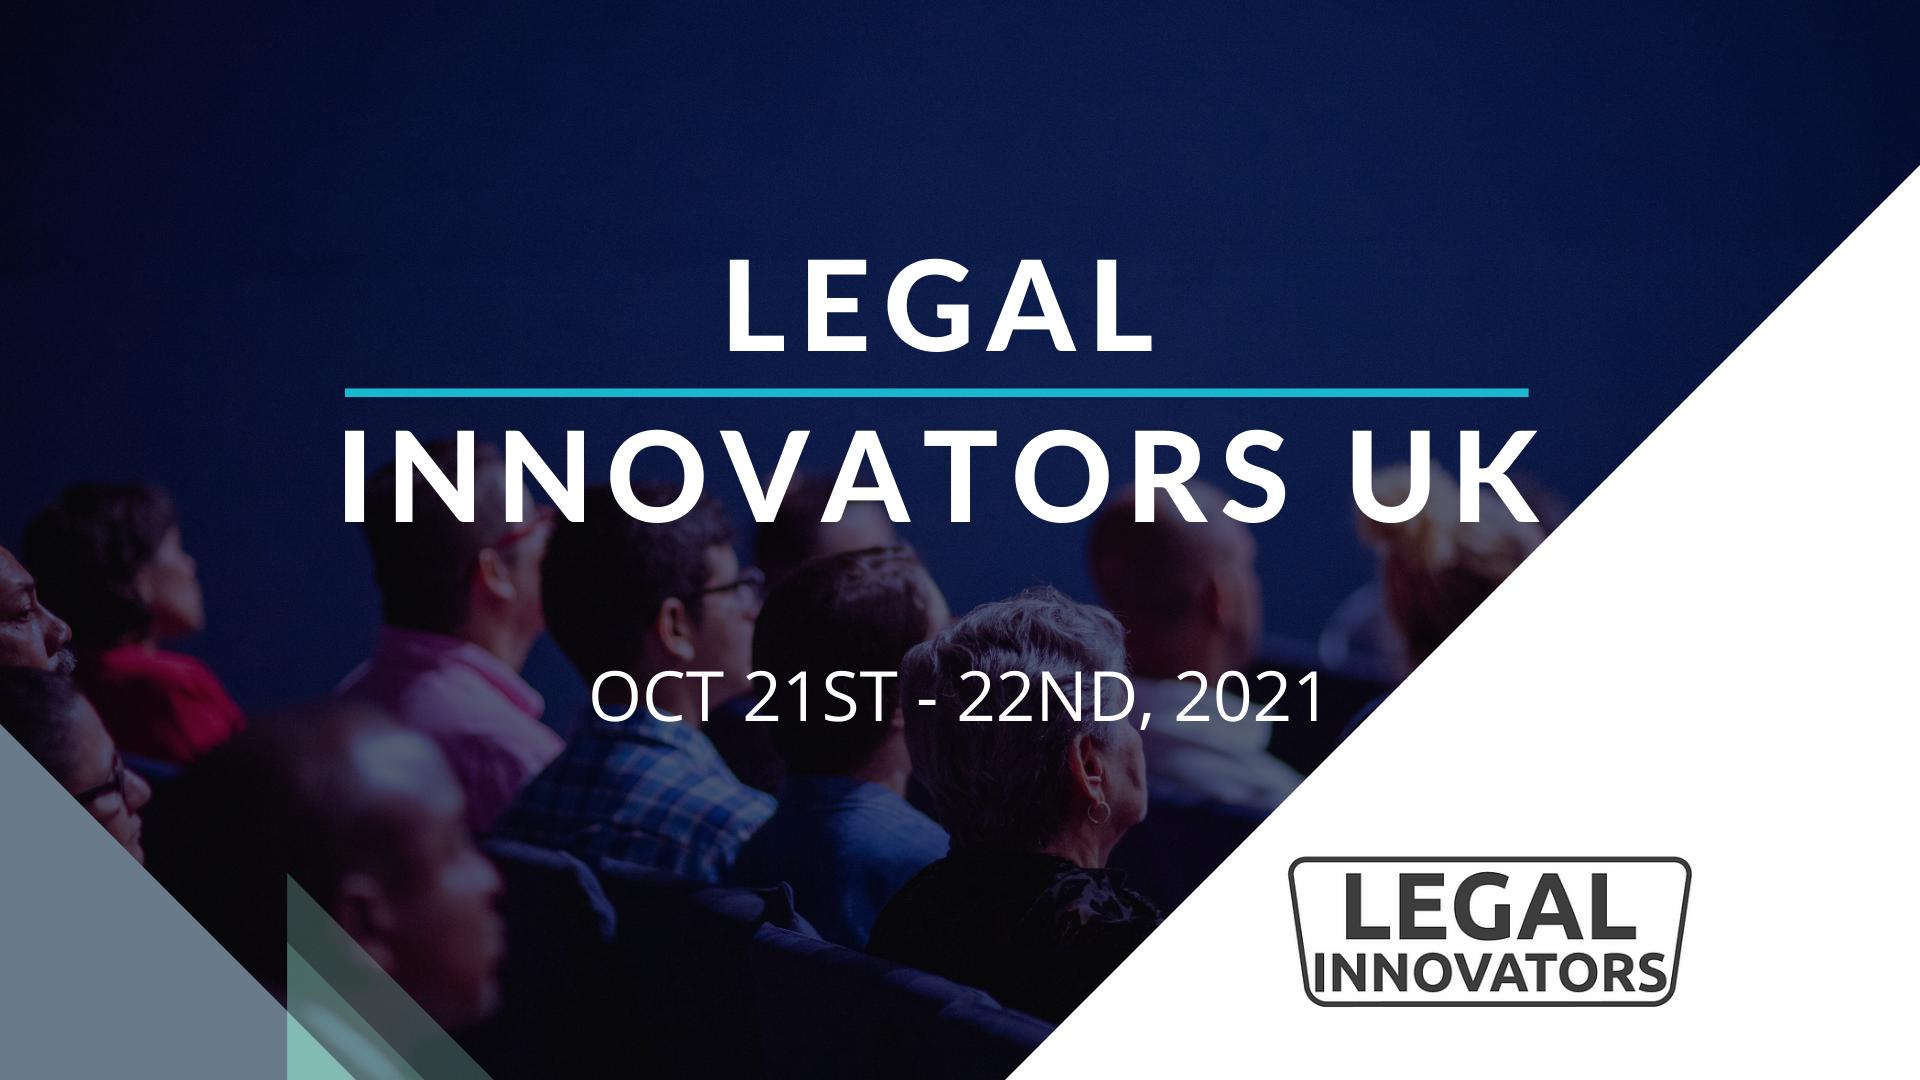 Legal Innovators UK